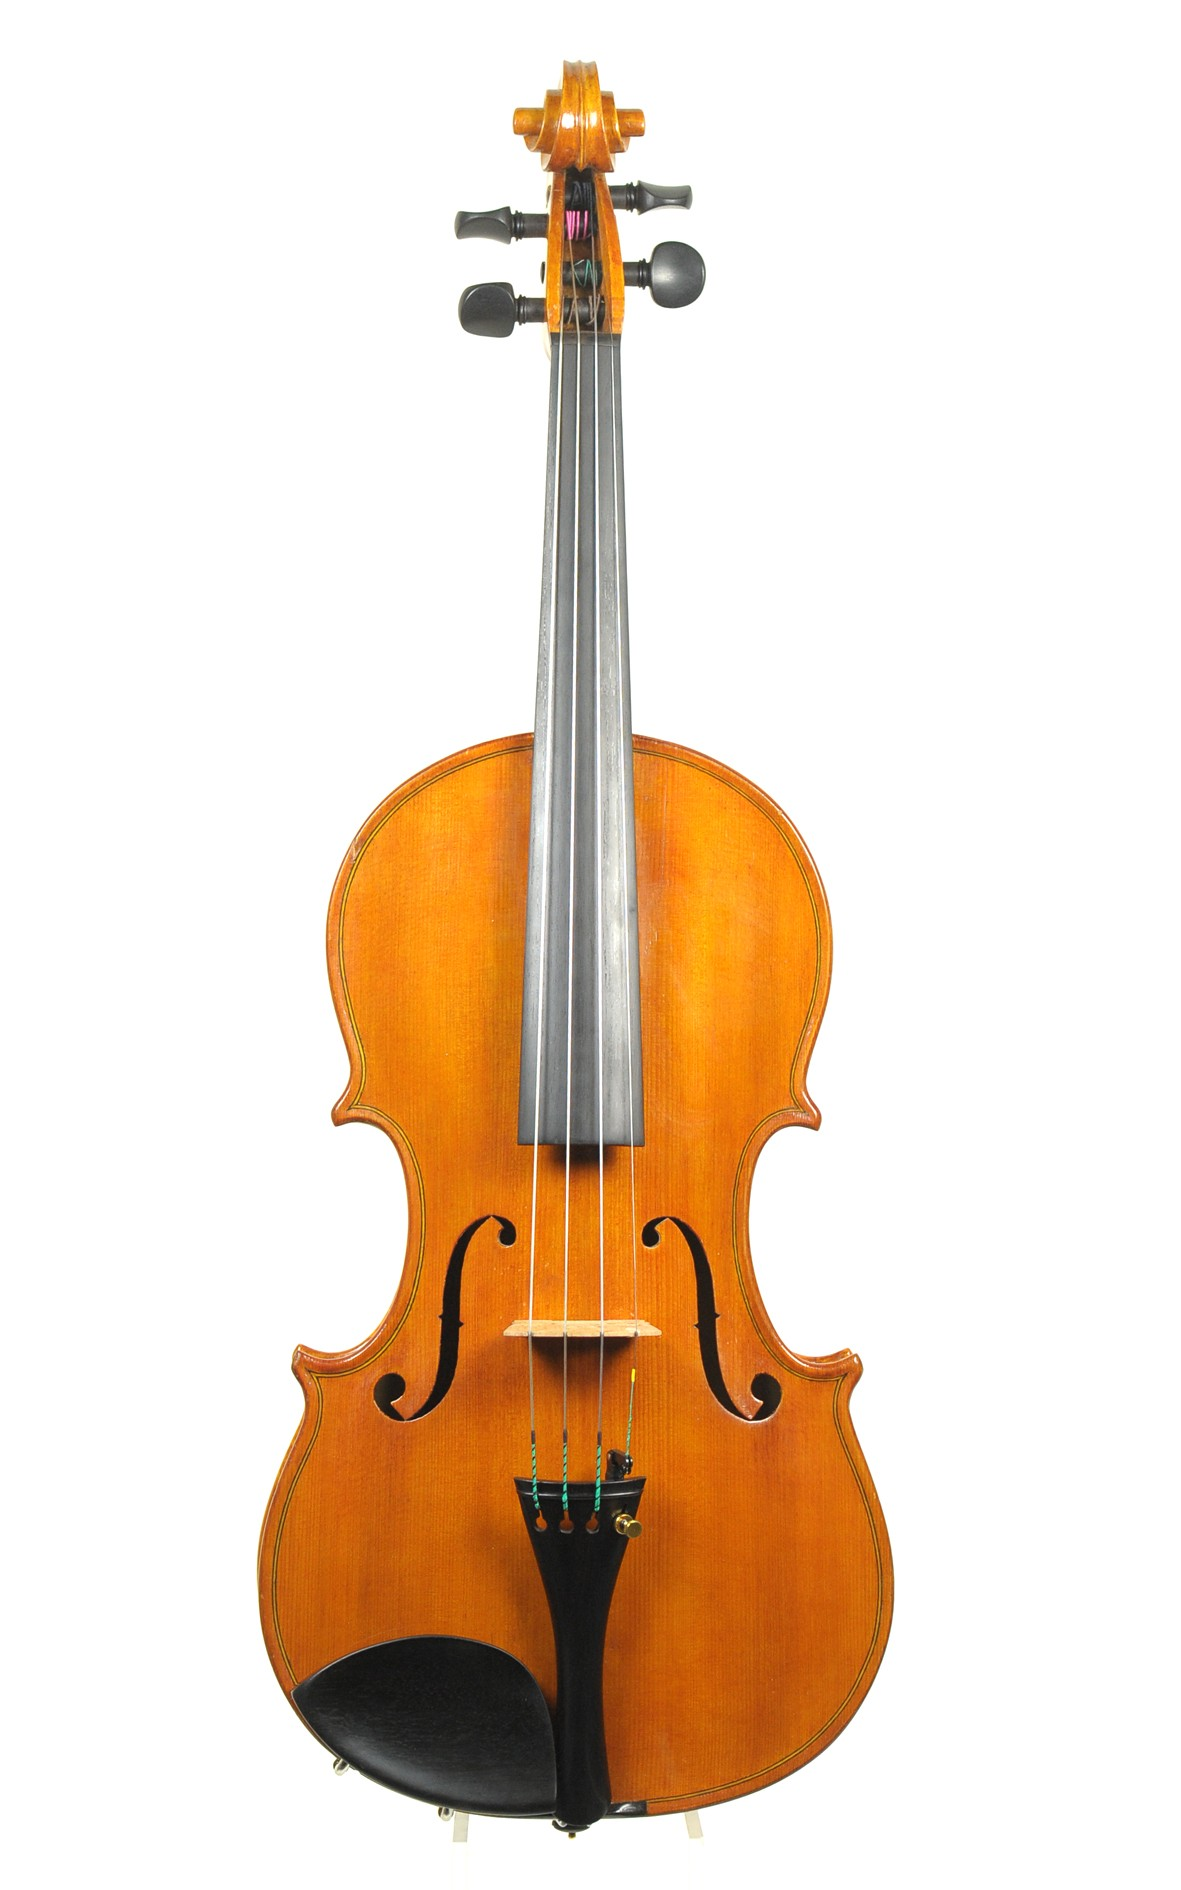 Italian violin, Luigi Agostinelli, 1953  - violin top view